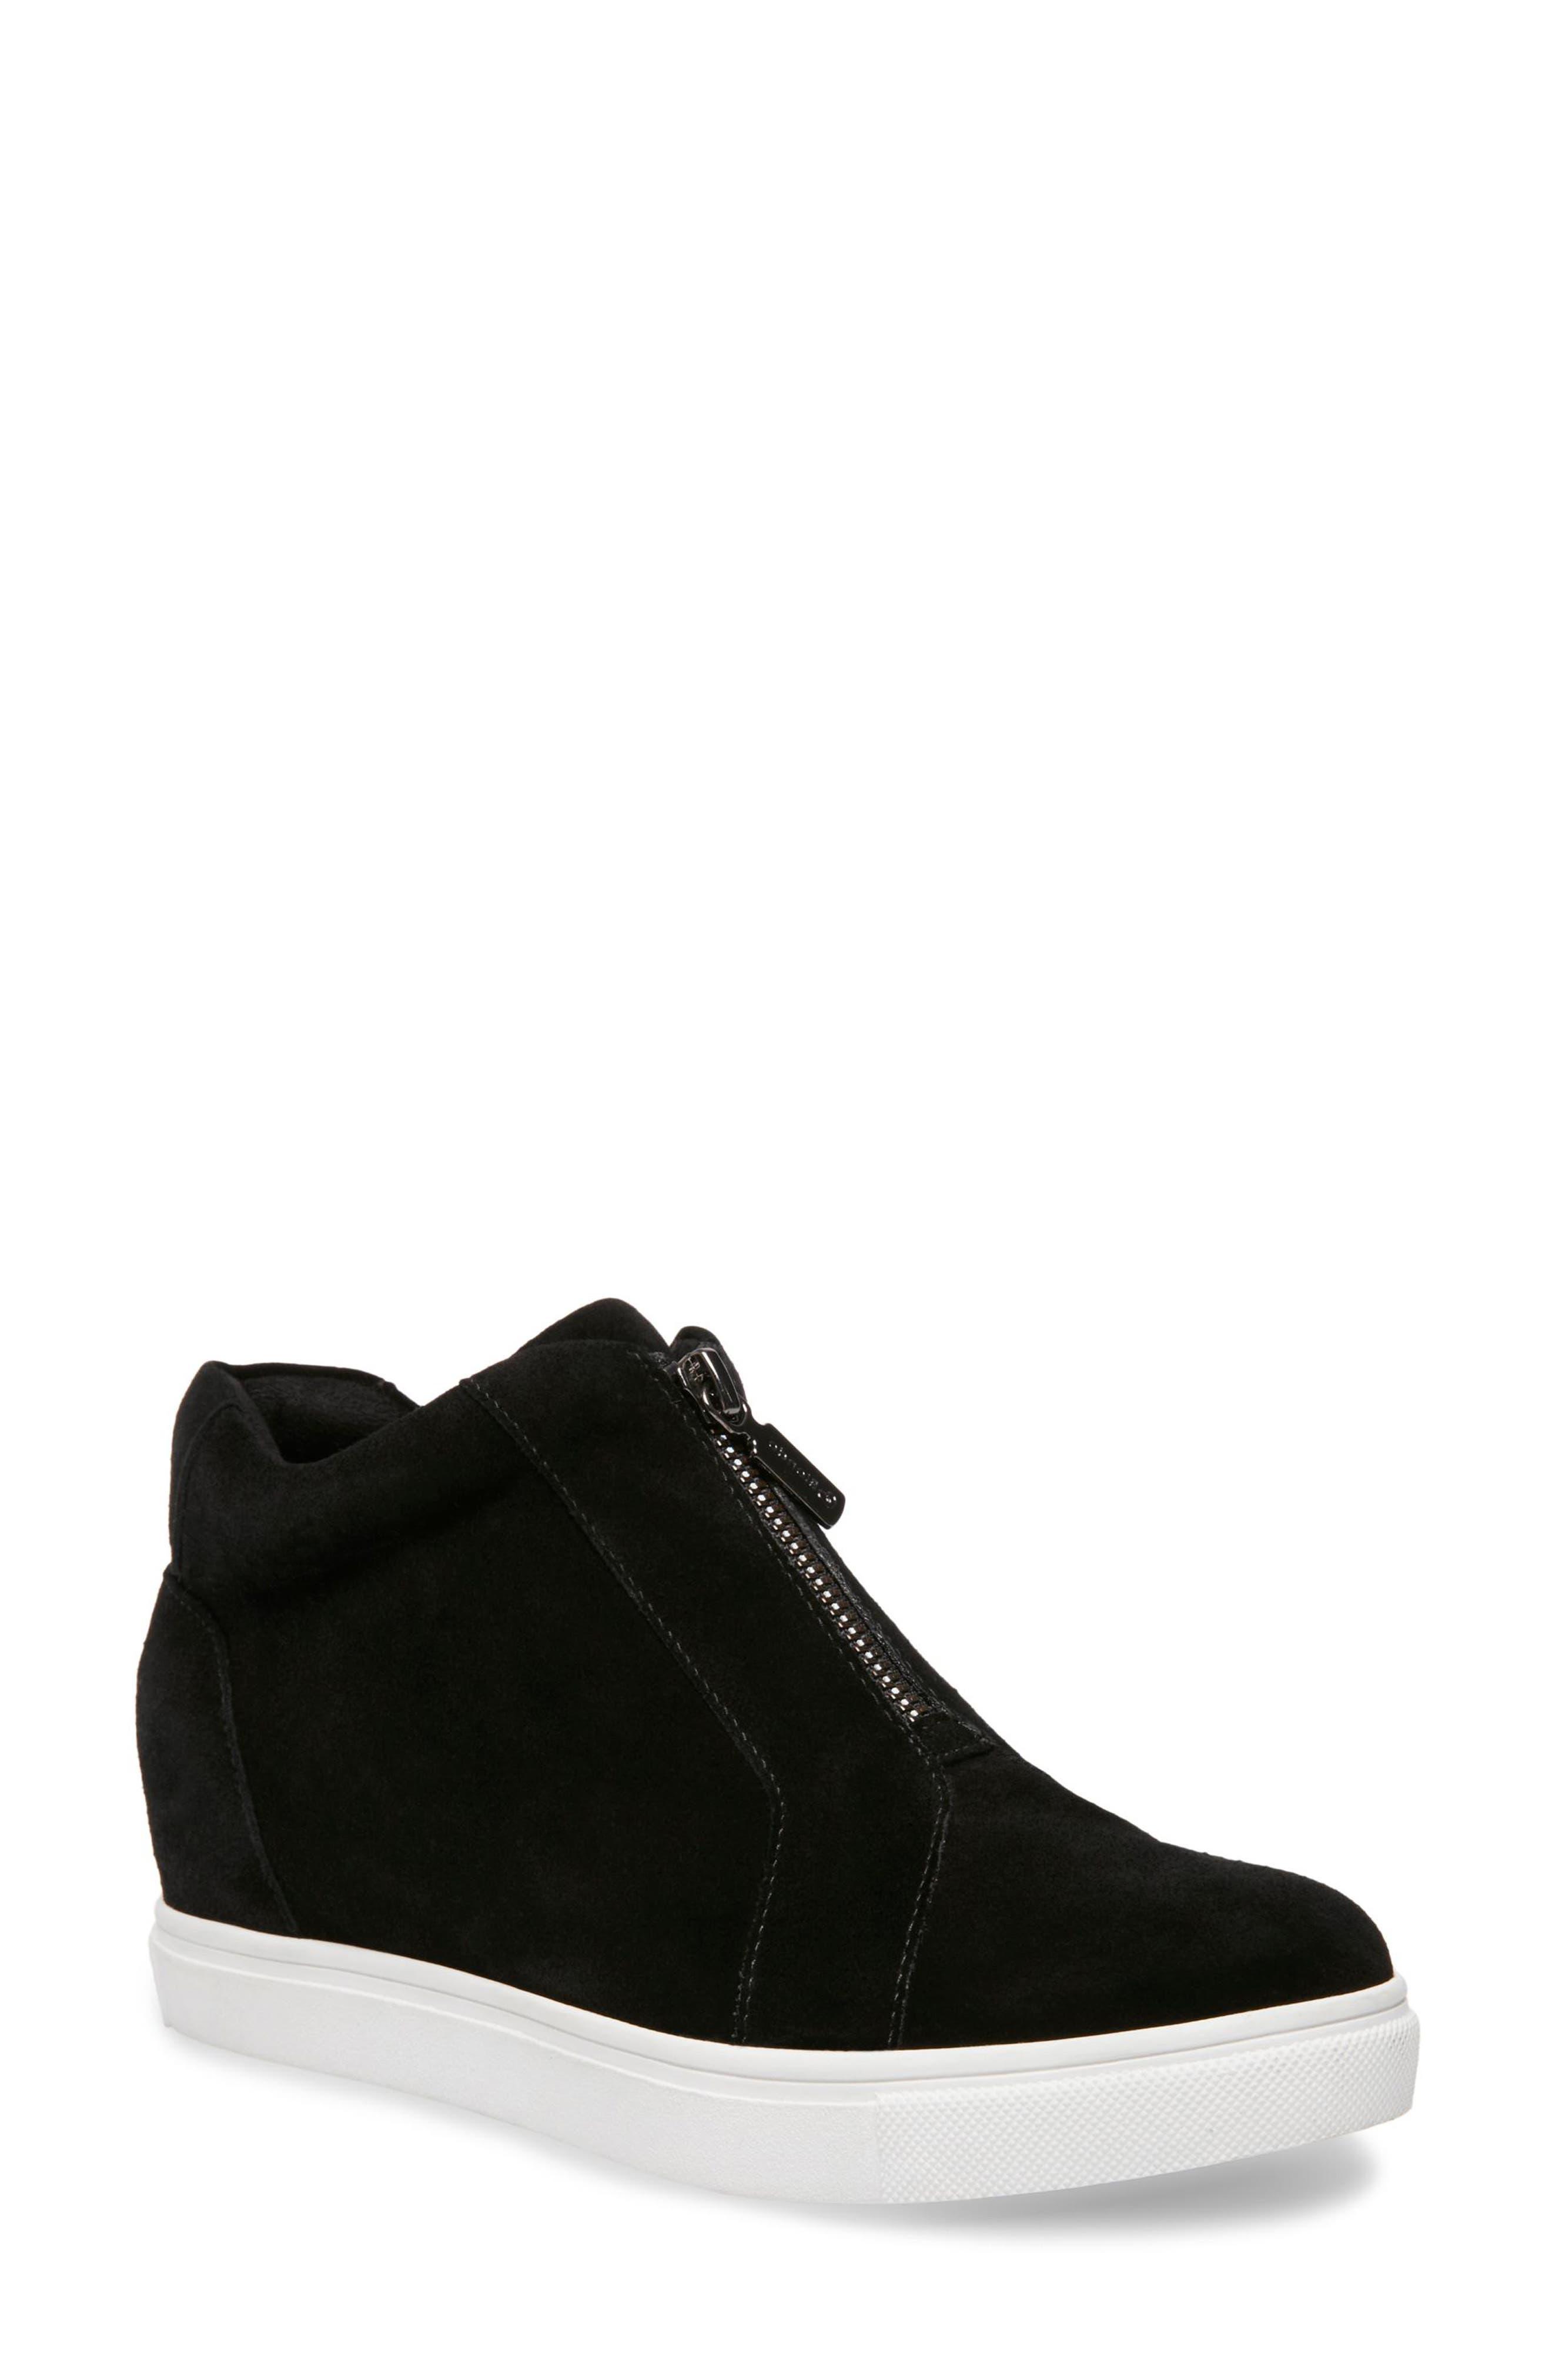 BLONDO, Glenda Waterproof Sneaker Bootie, Main thumbnail 1, color, BLACK SUEDE